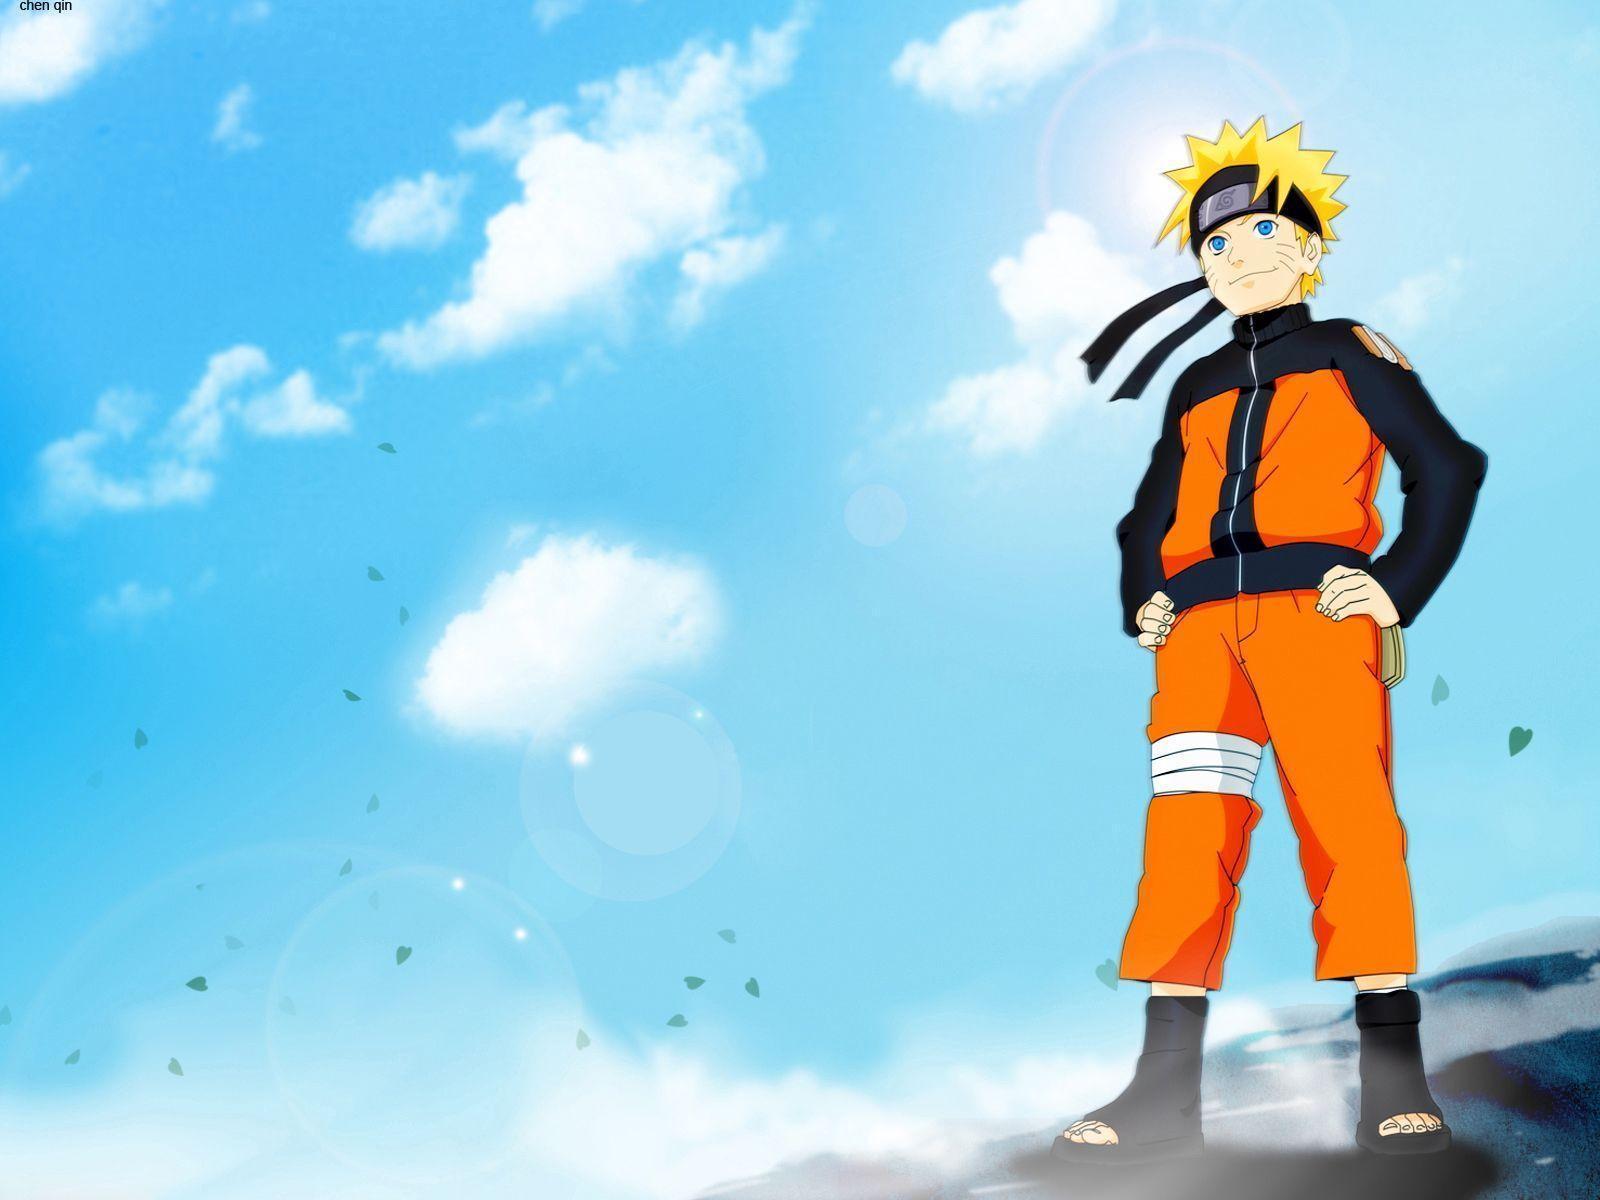 Naruto Wallpaper HD 46 Backgrounds | Wallruru.